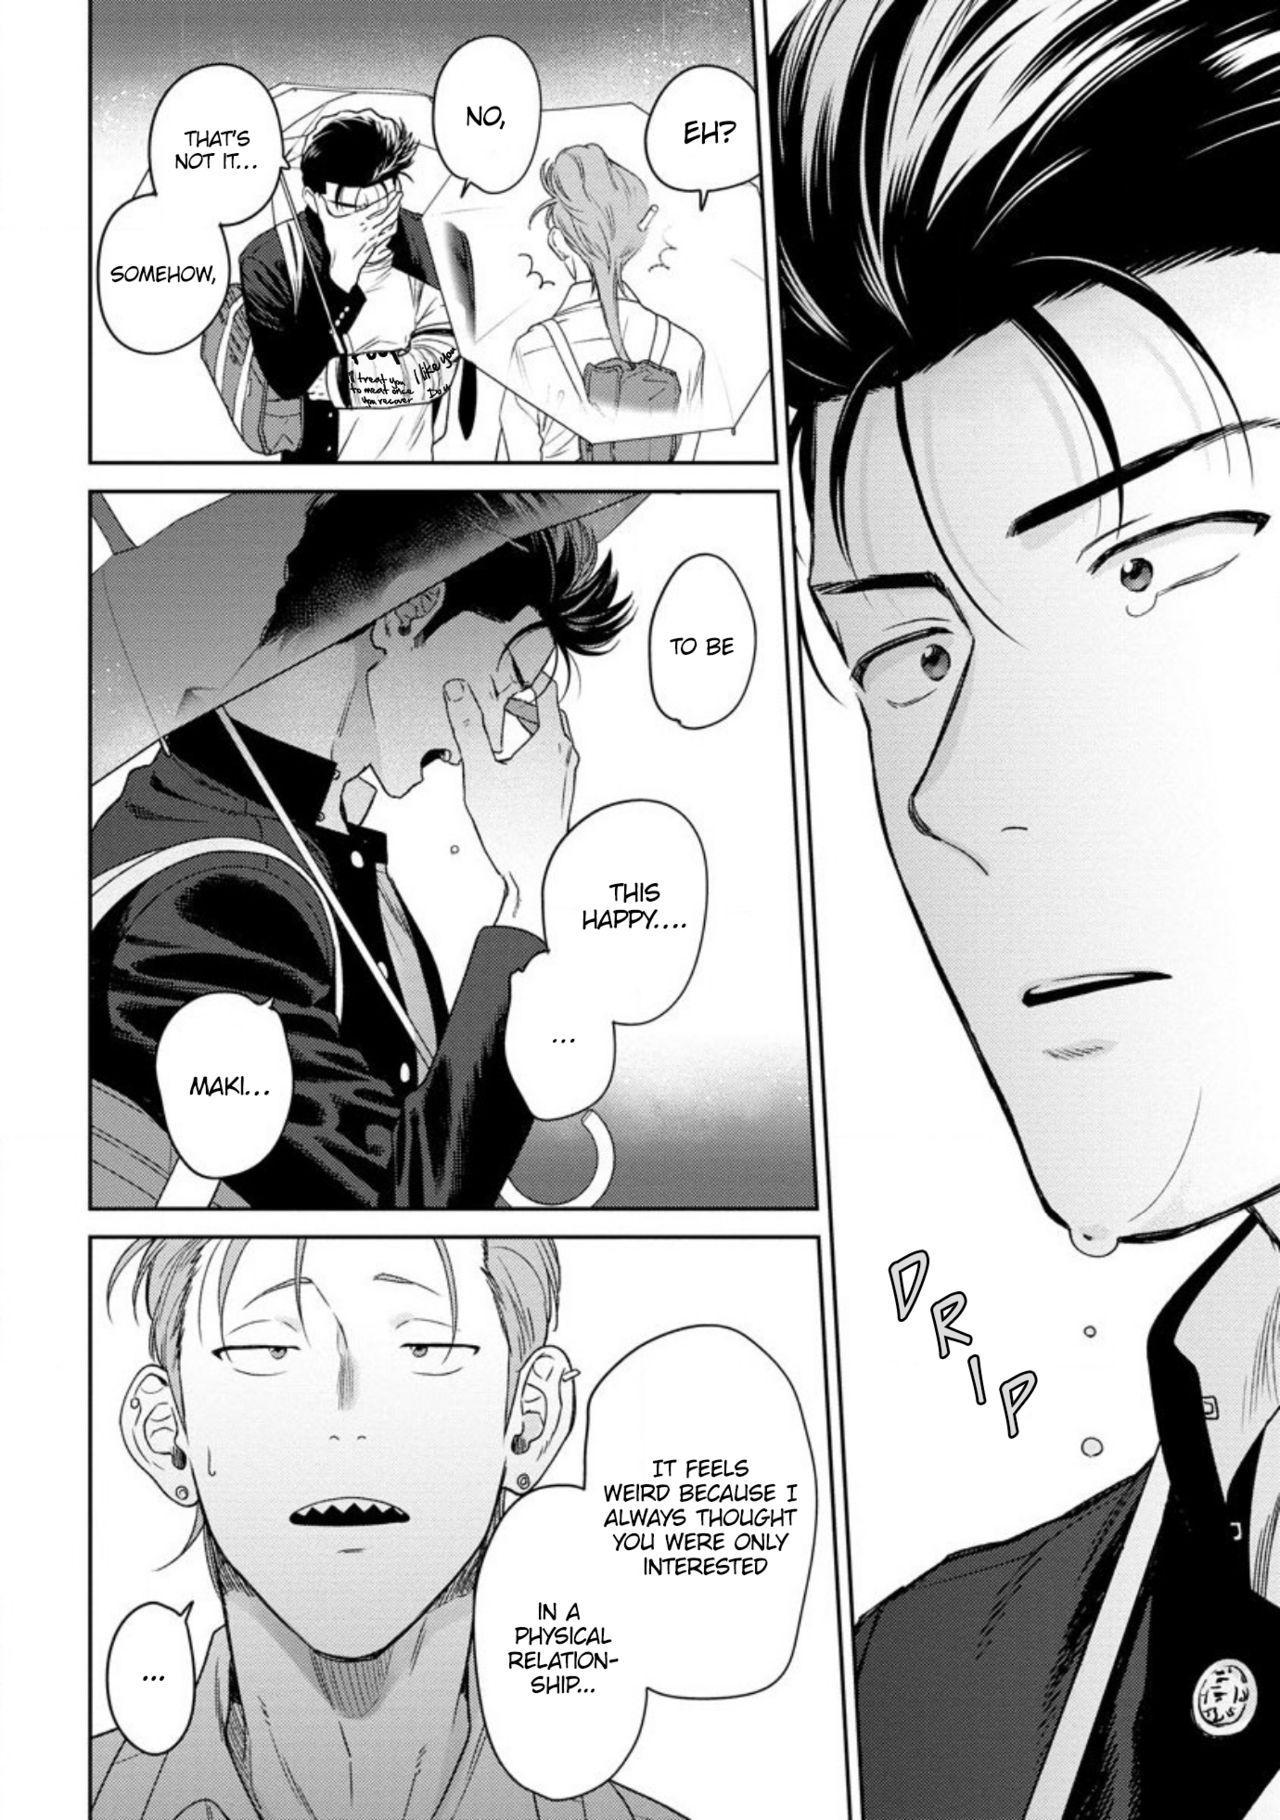 [Hiiragi Nozomu] Nakasete Yaru yo Yankee-kun   I'll Make You Cry Ch. 1-5 + Extras [English] [Digital] 174